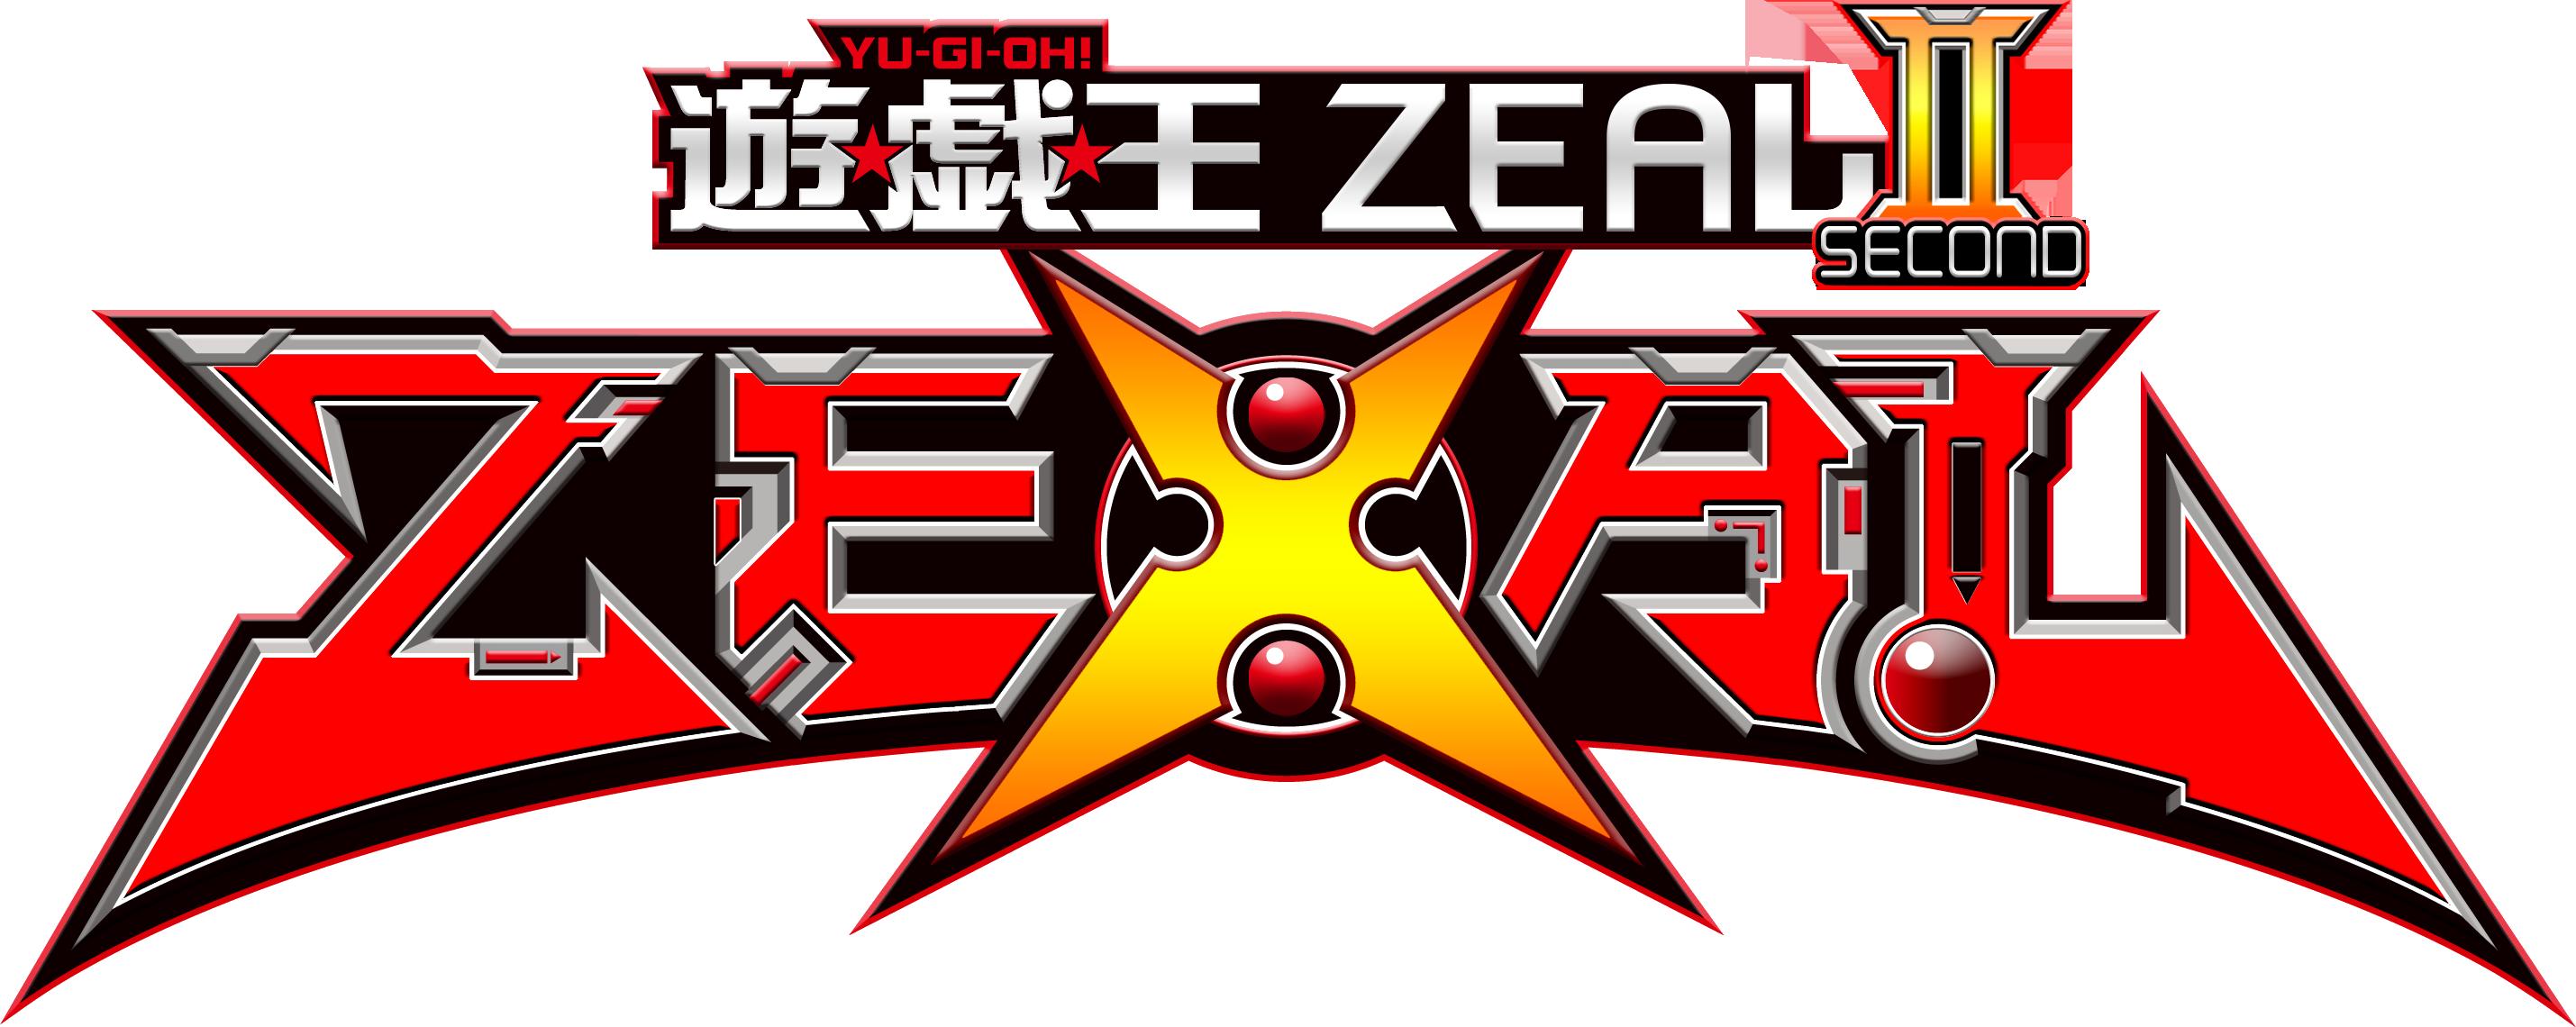 Japanese Logo Generator - senchou info